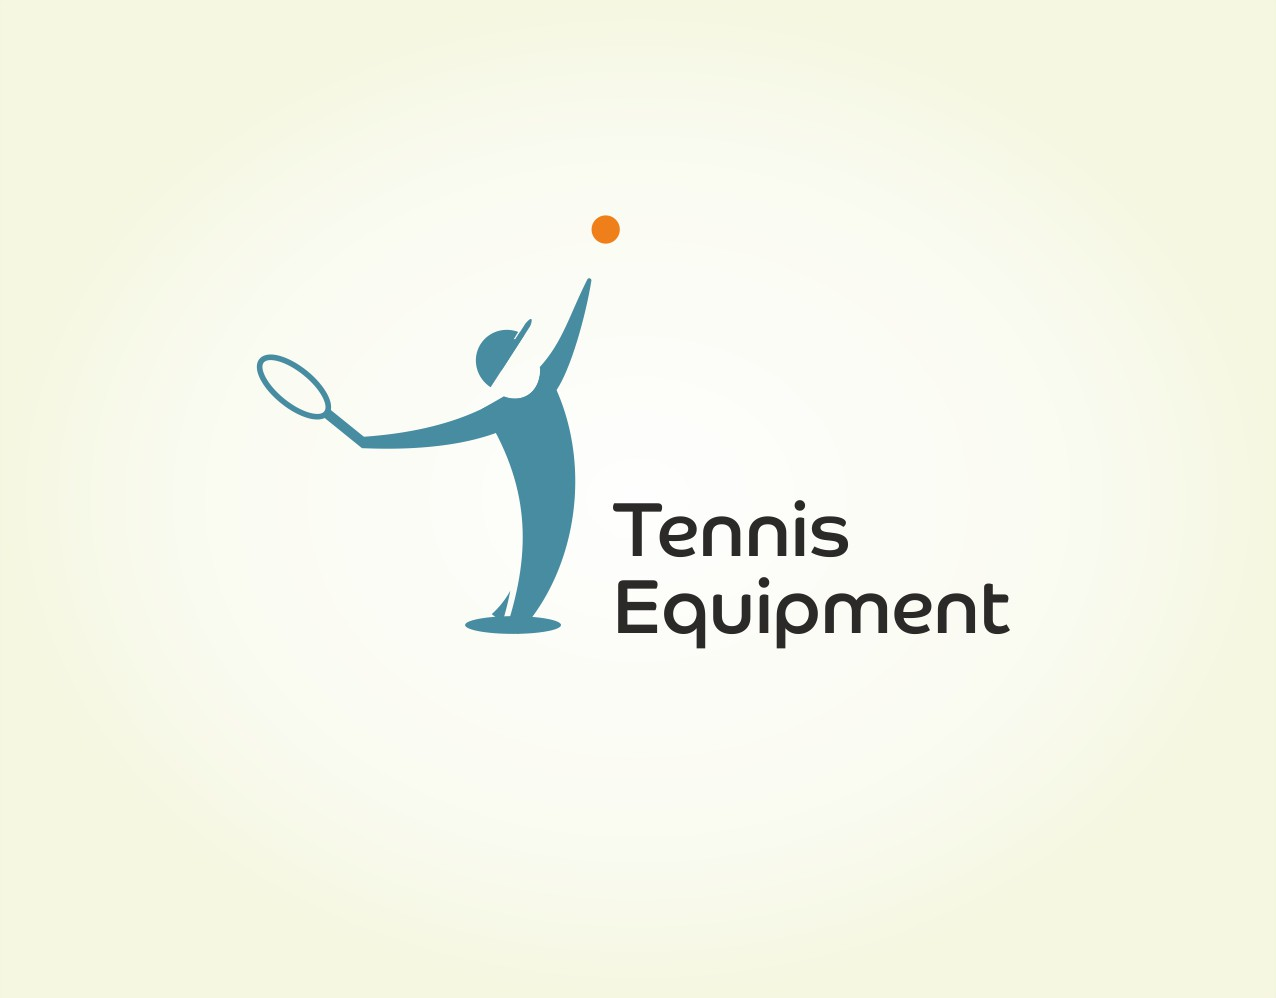 Лого для магазина оборудования для тенниса